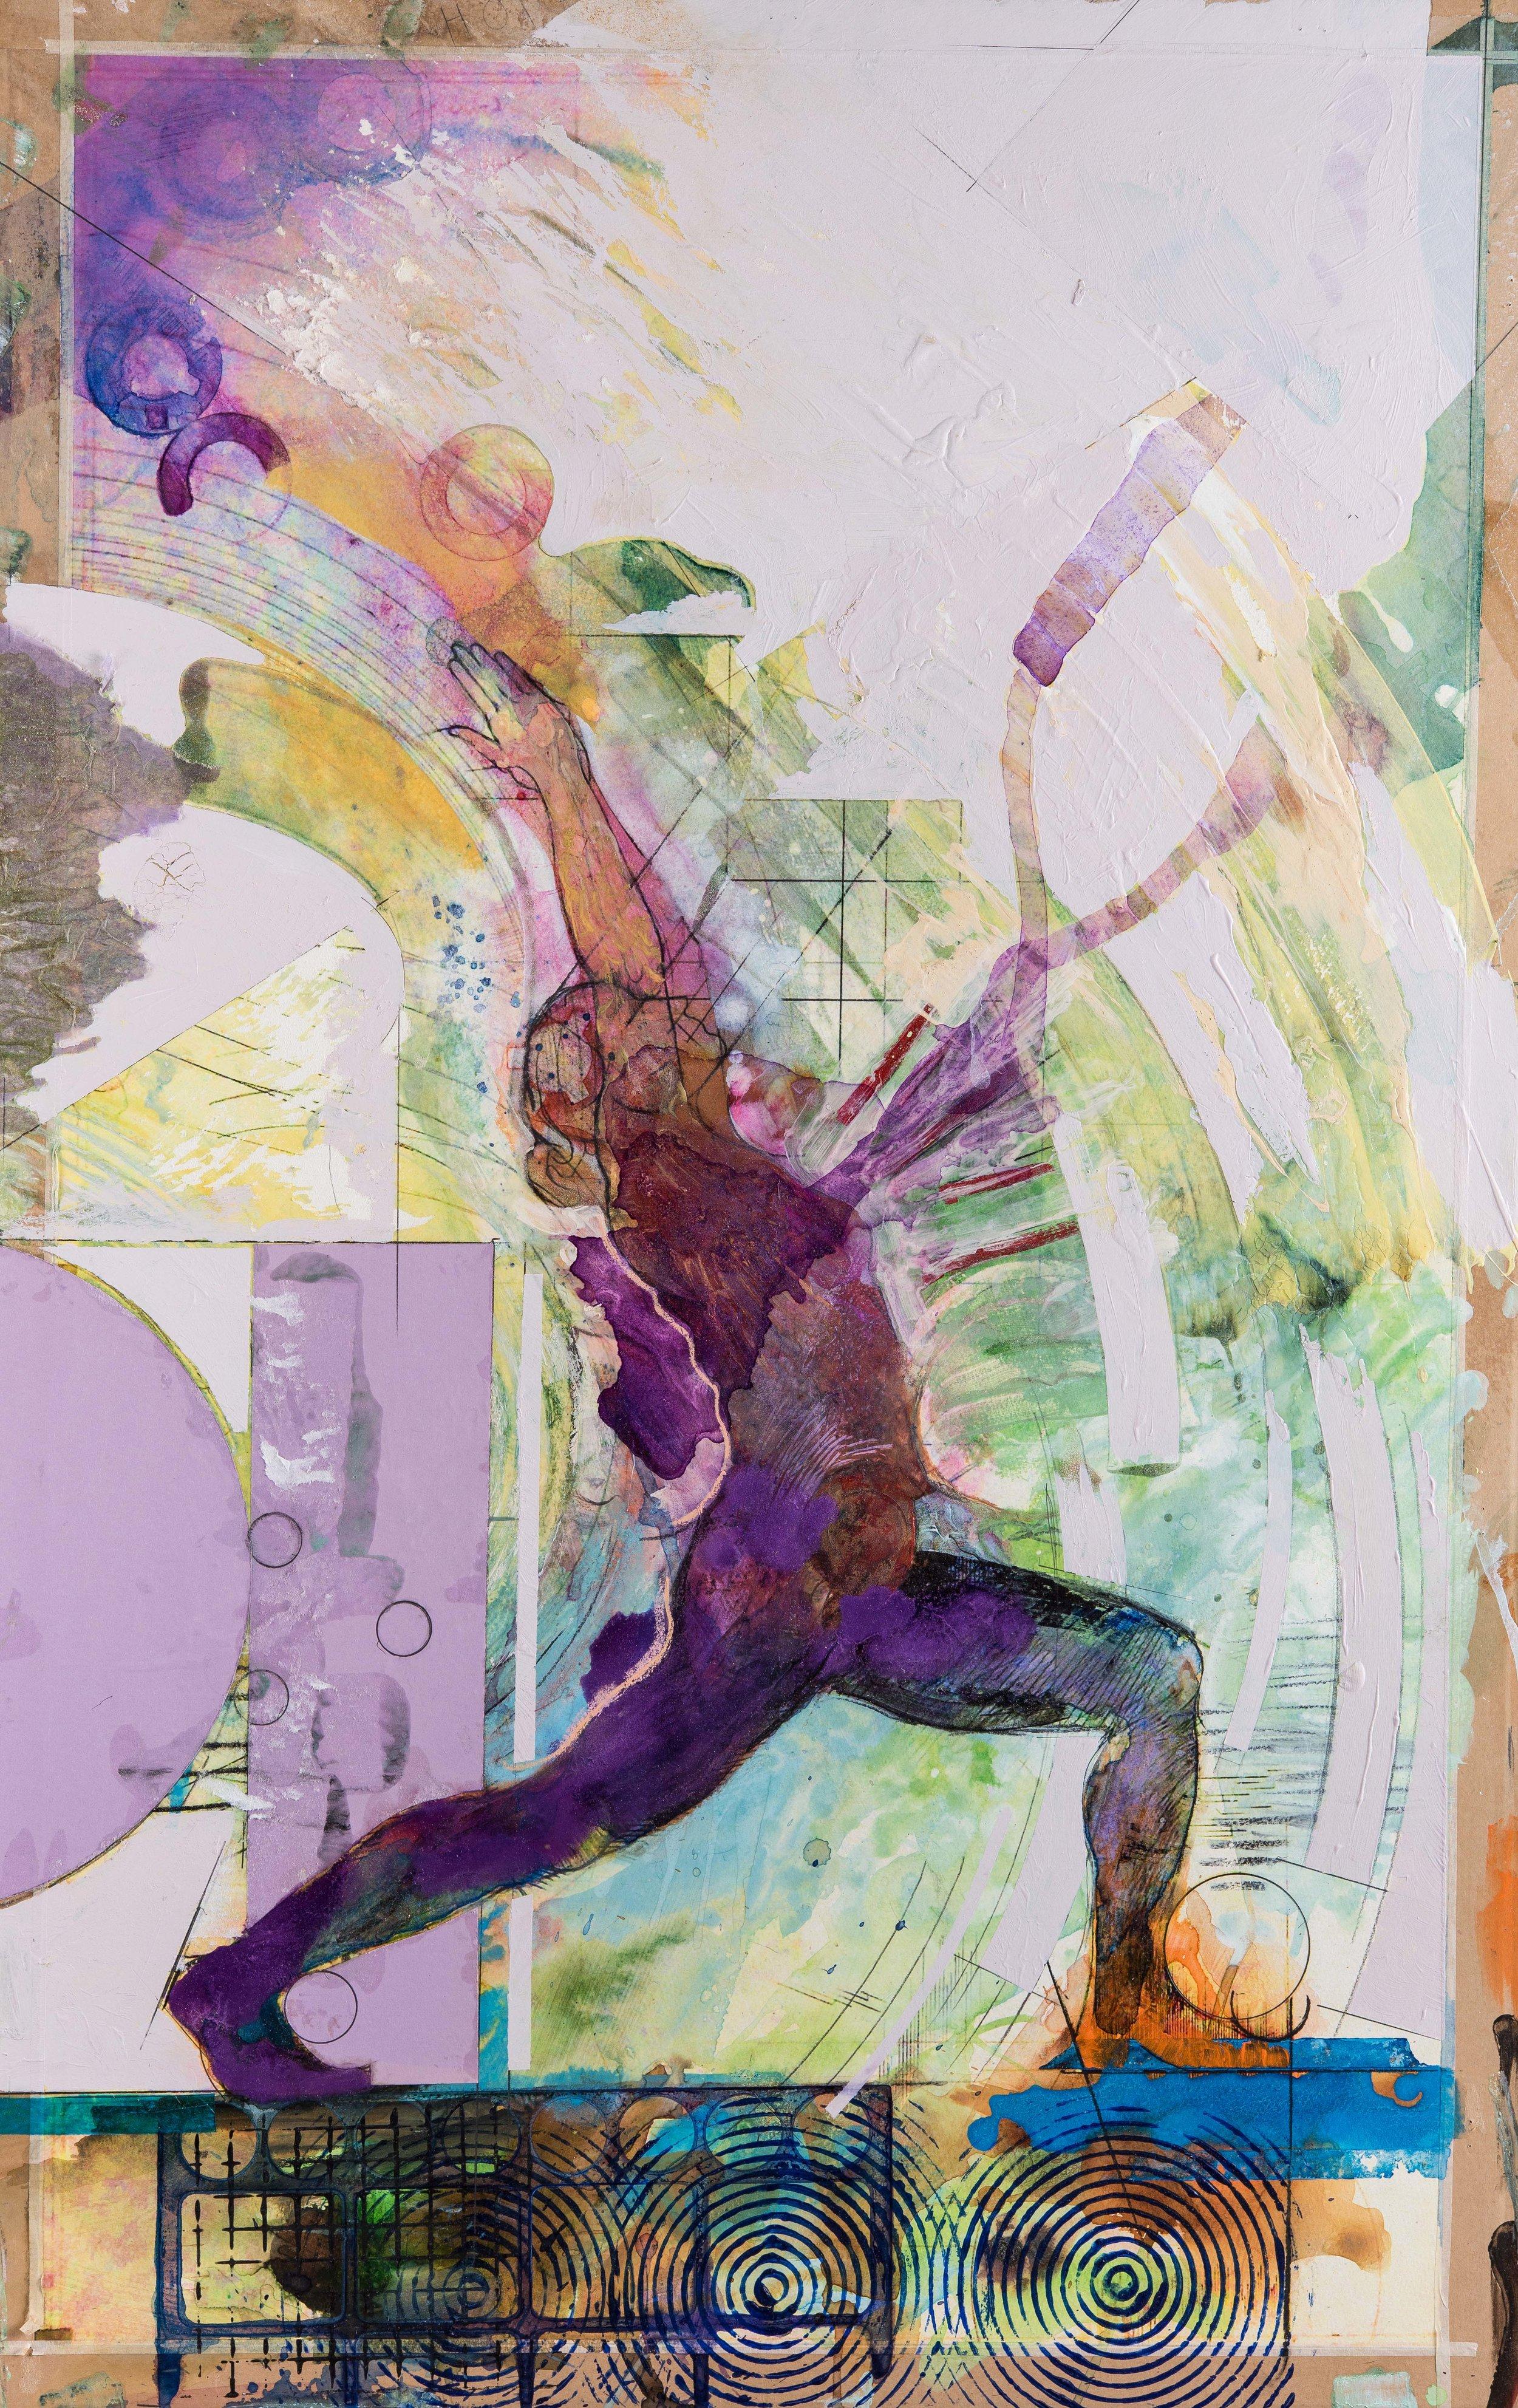 Bob Bosco's Yoga — 3/30/17 - Bob Bosco: A Painter's Yoga Journey